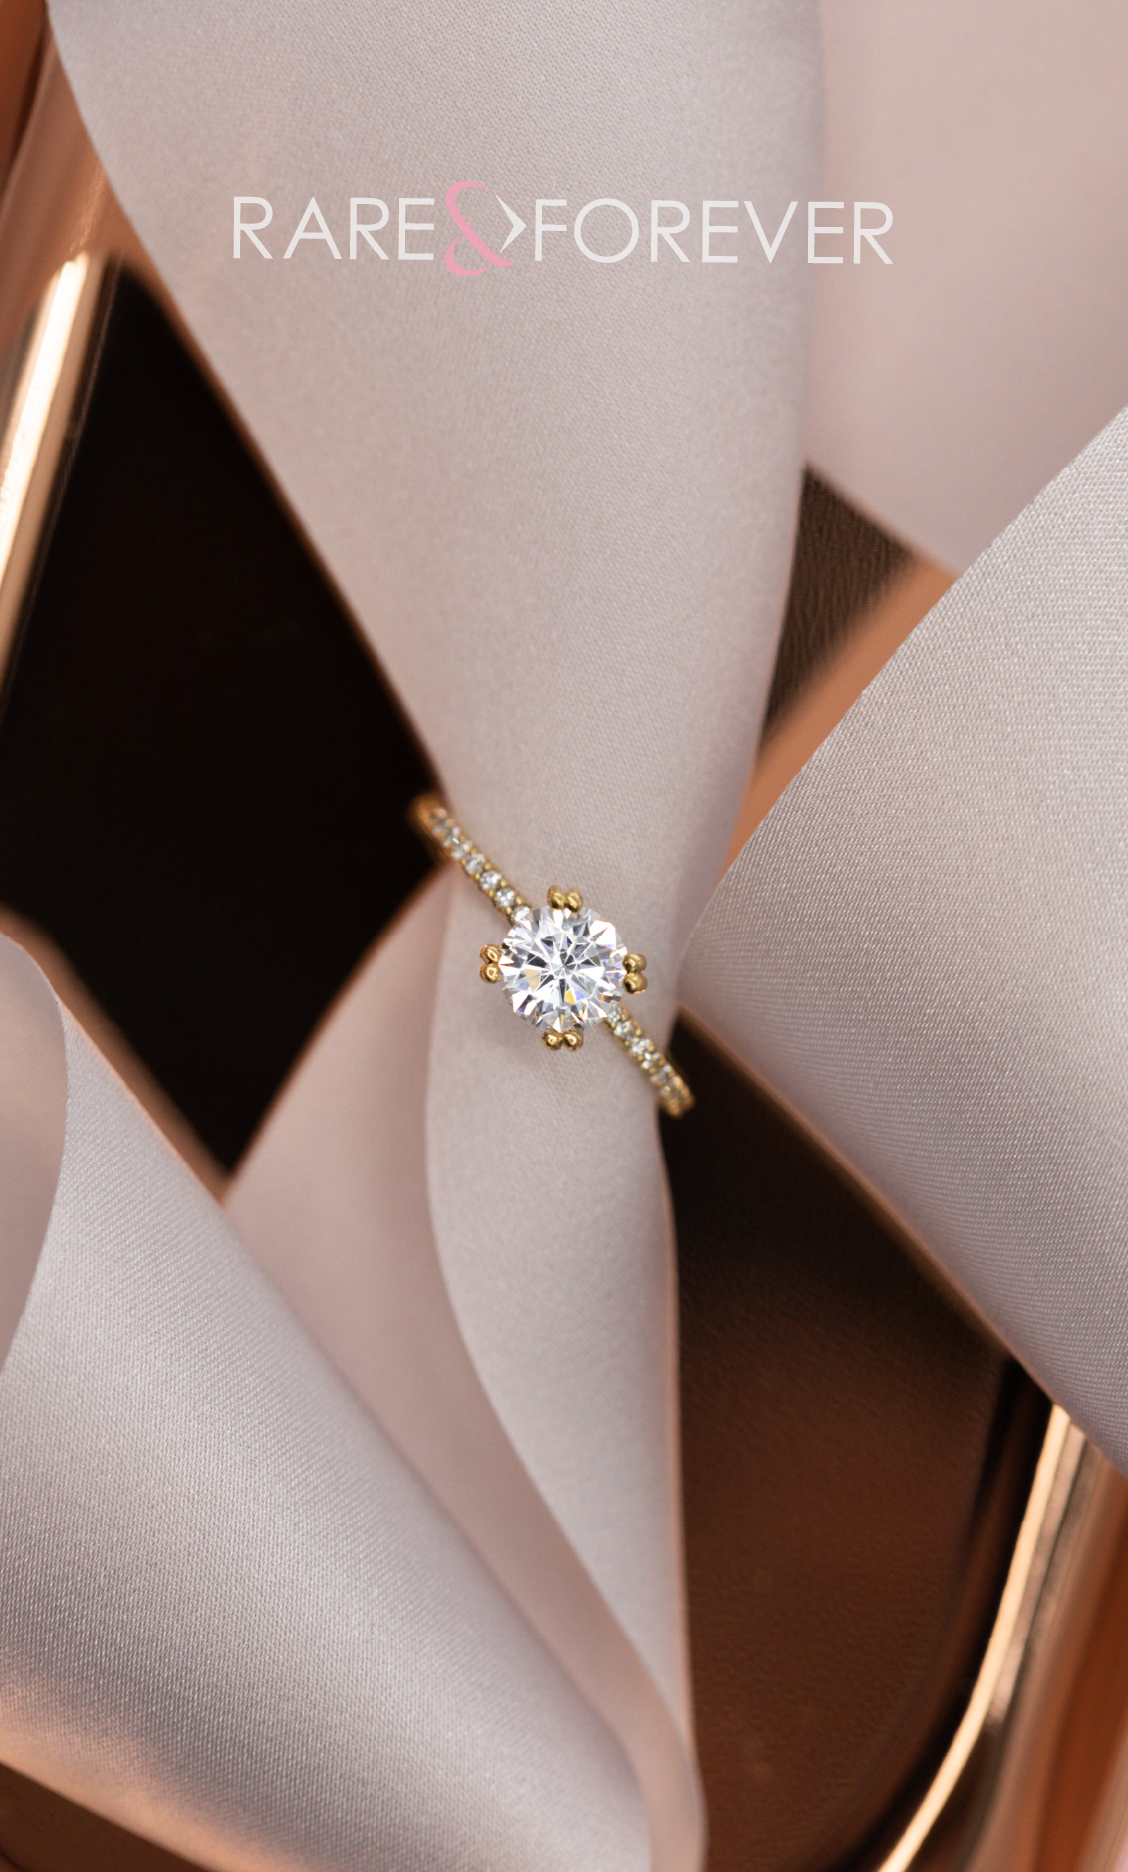 My Dream Ring In 2020 Diamond Dreams Wedding Day Jewelry Diamond